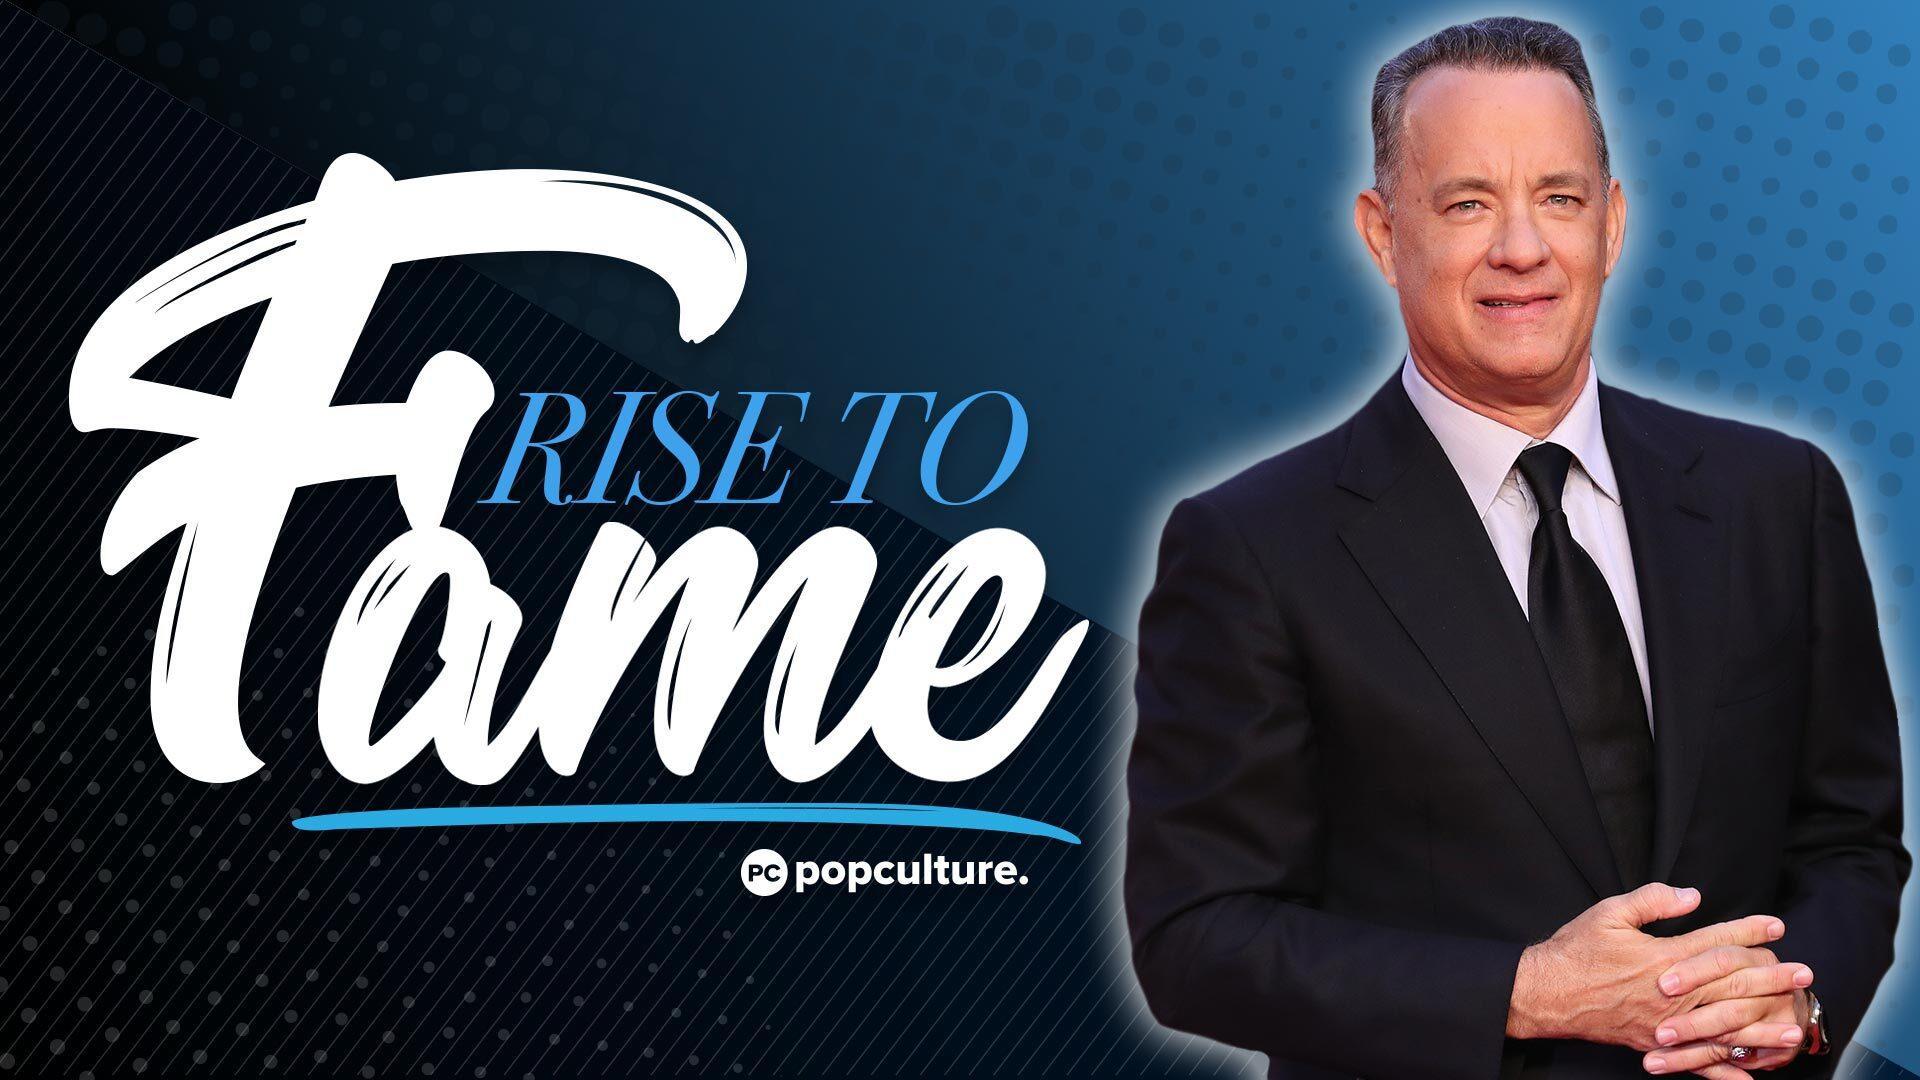 Tom Hanks Rise to Fame